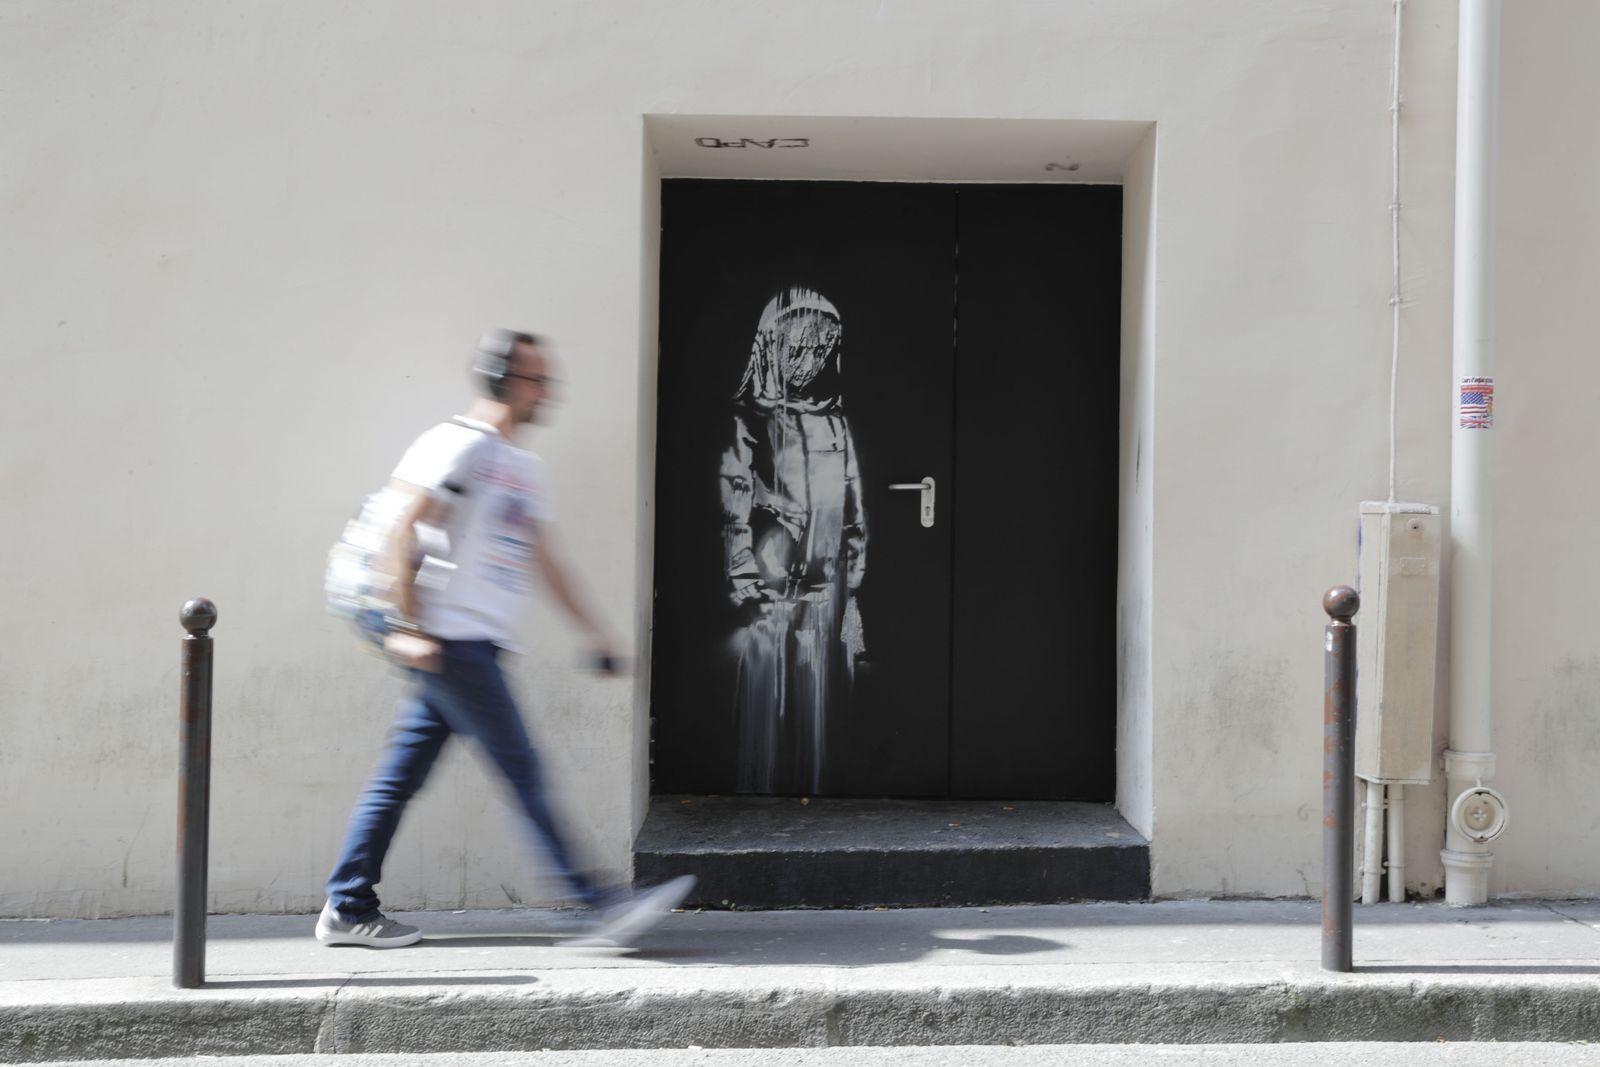 FRANCE-STREET-ART-BANSKY